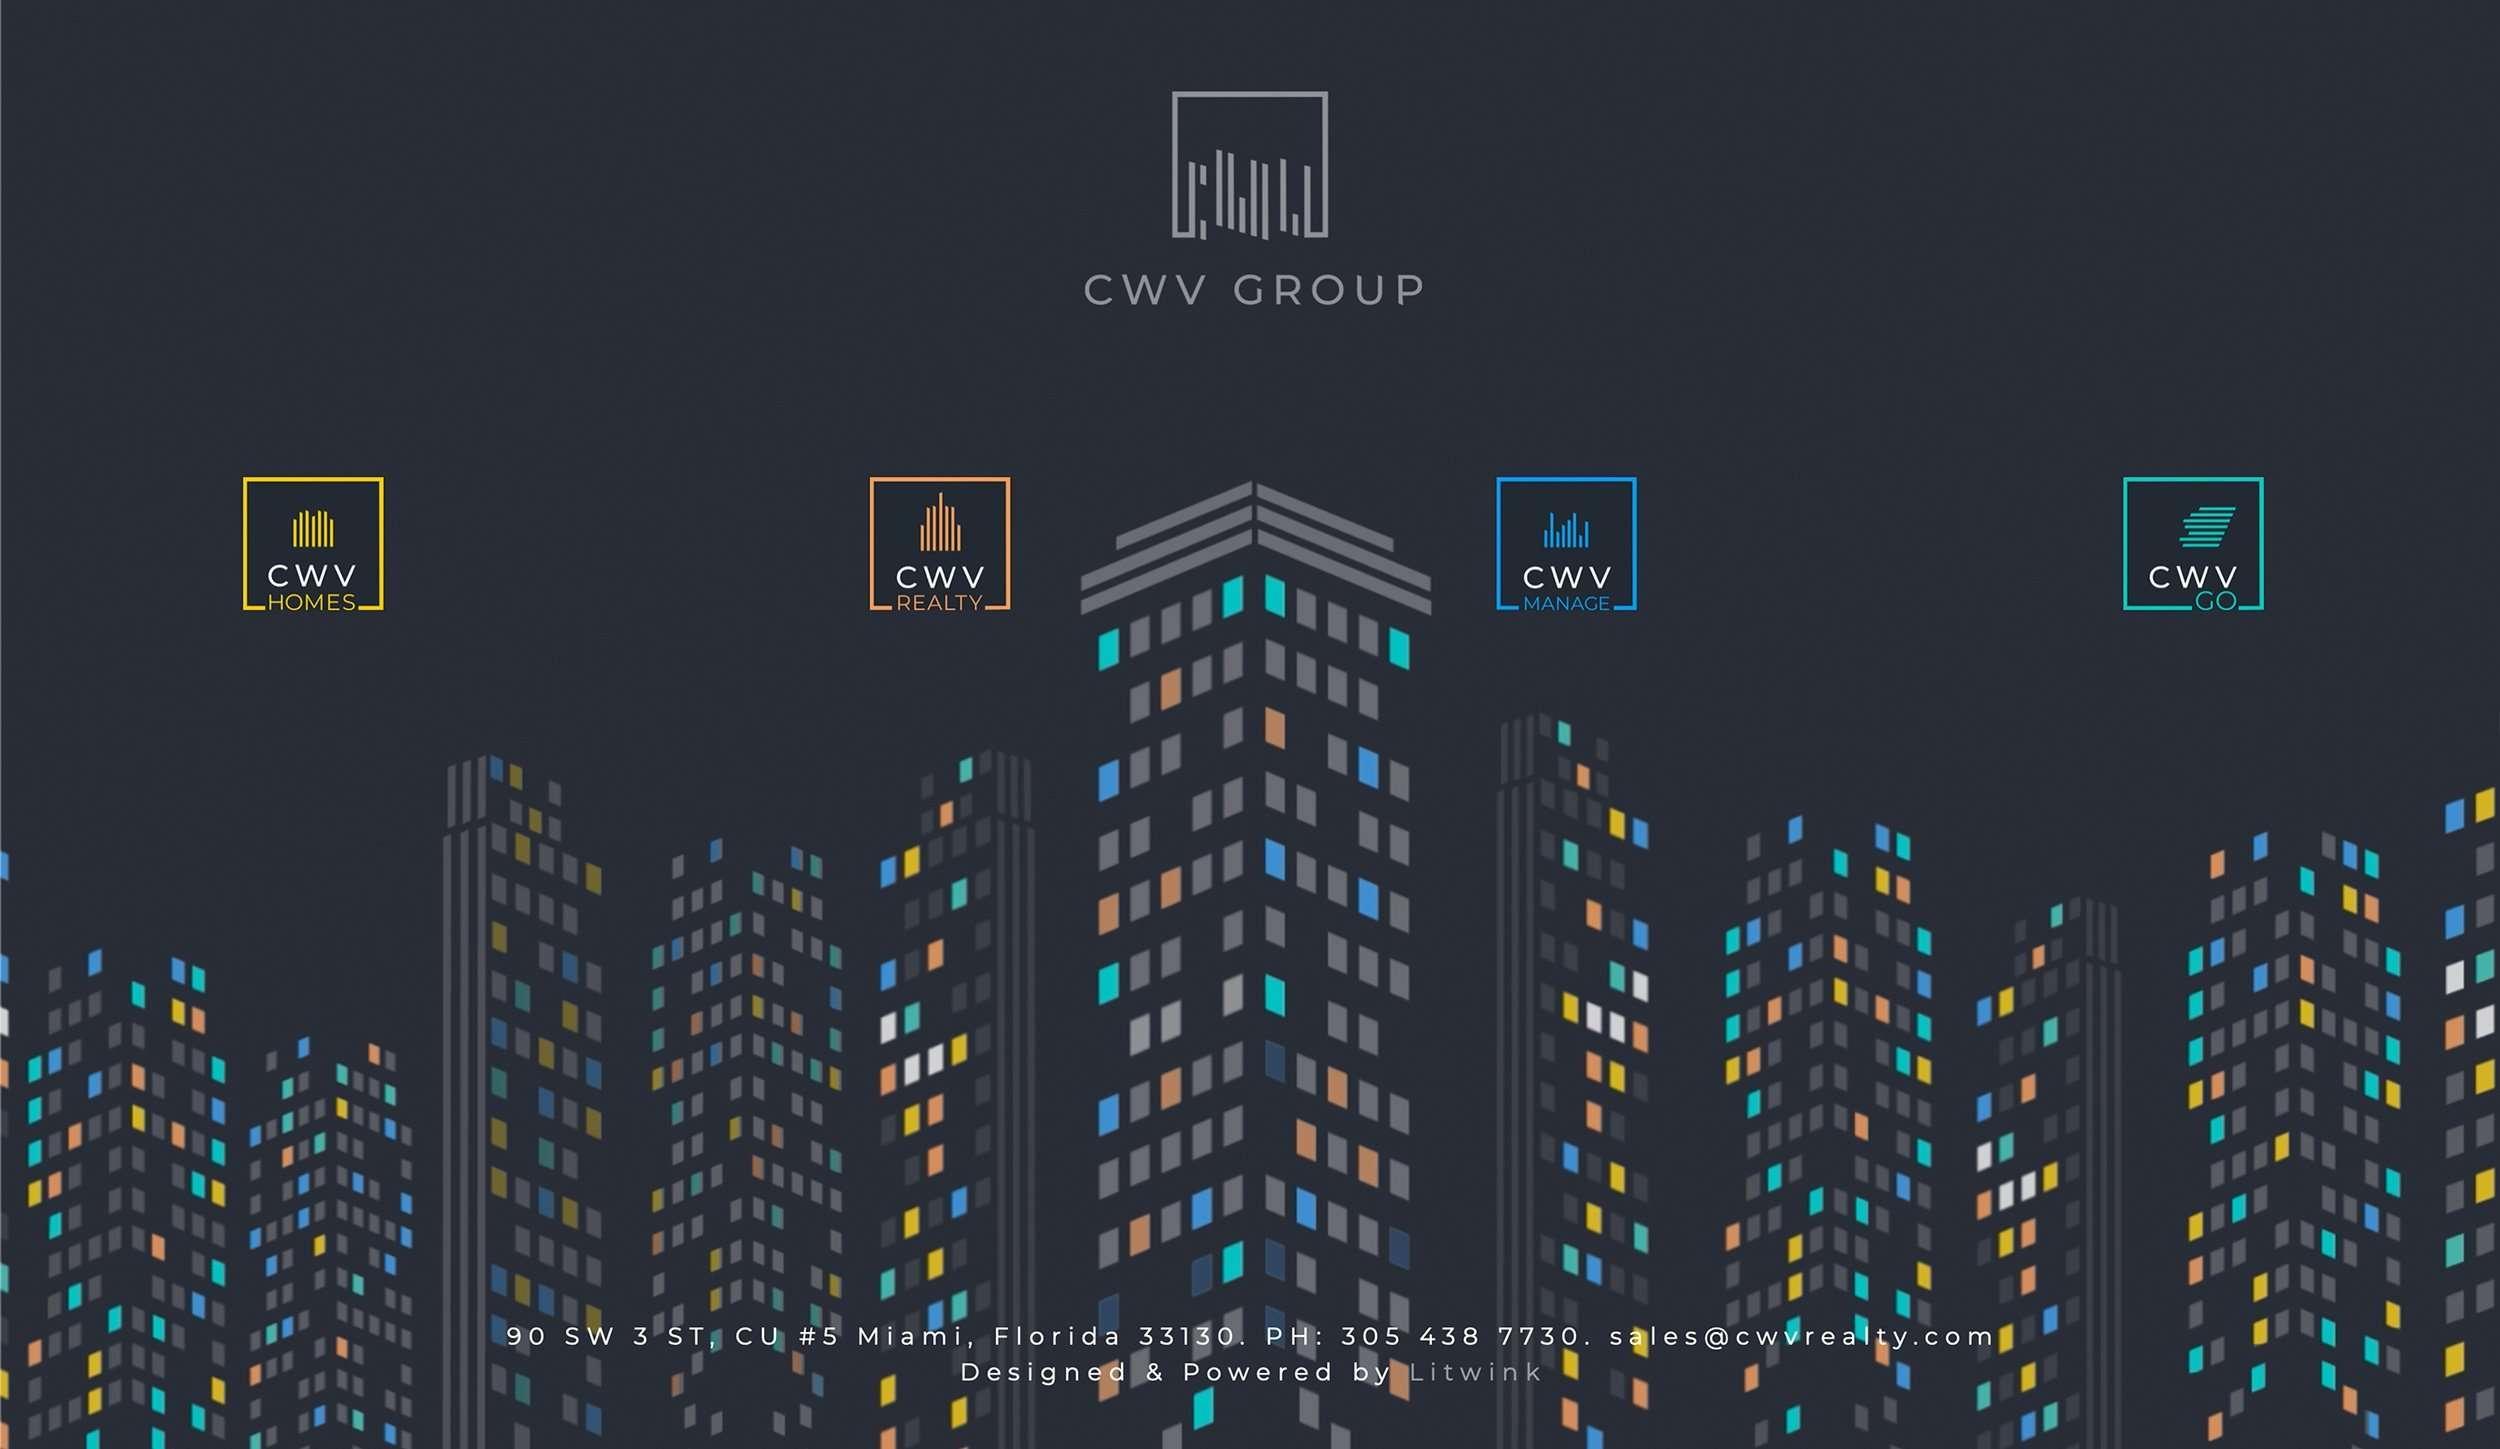 cwv-group-miami-usa-estados-unidos-real-estate-online-lab-lisbon-web-development-web-design-1